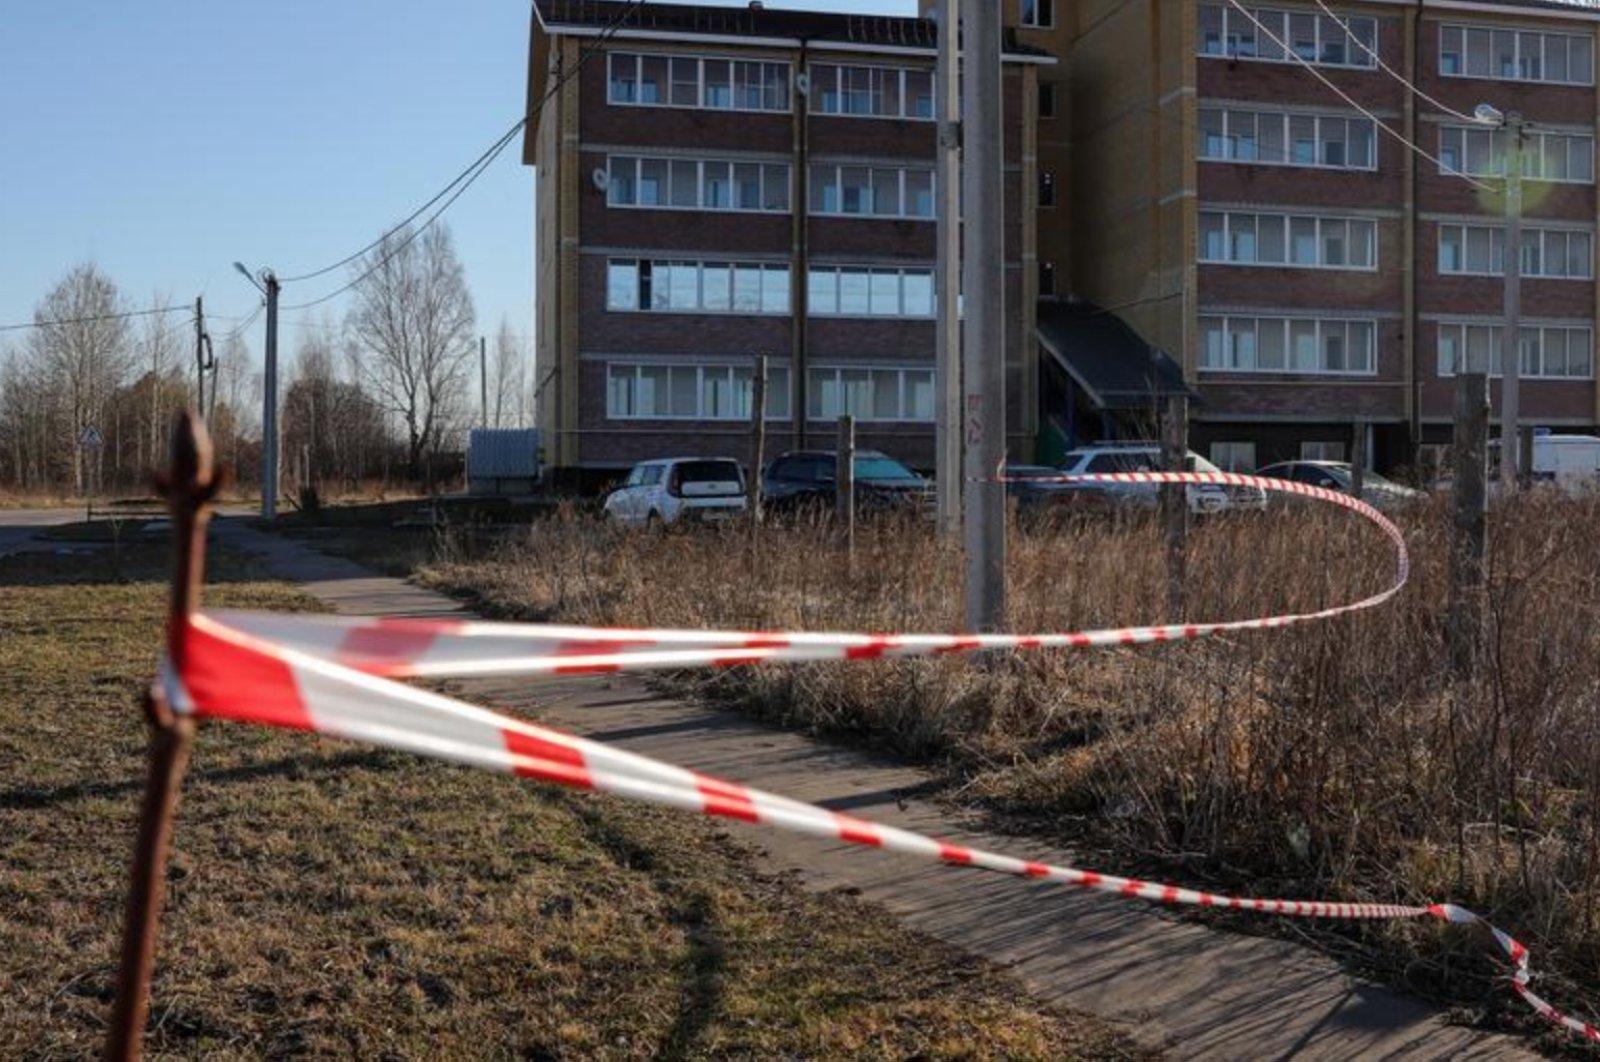 The crime scene in Russia's Ryazan (DPA Photo)